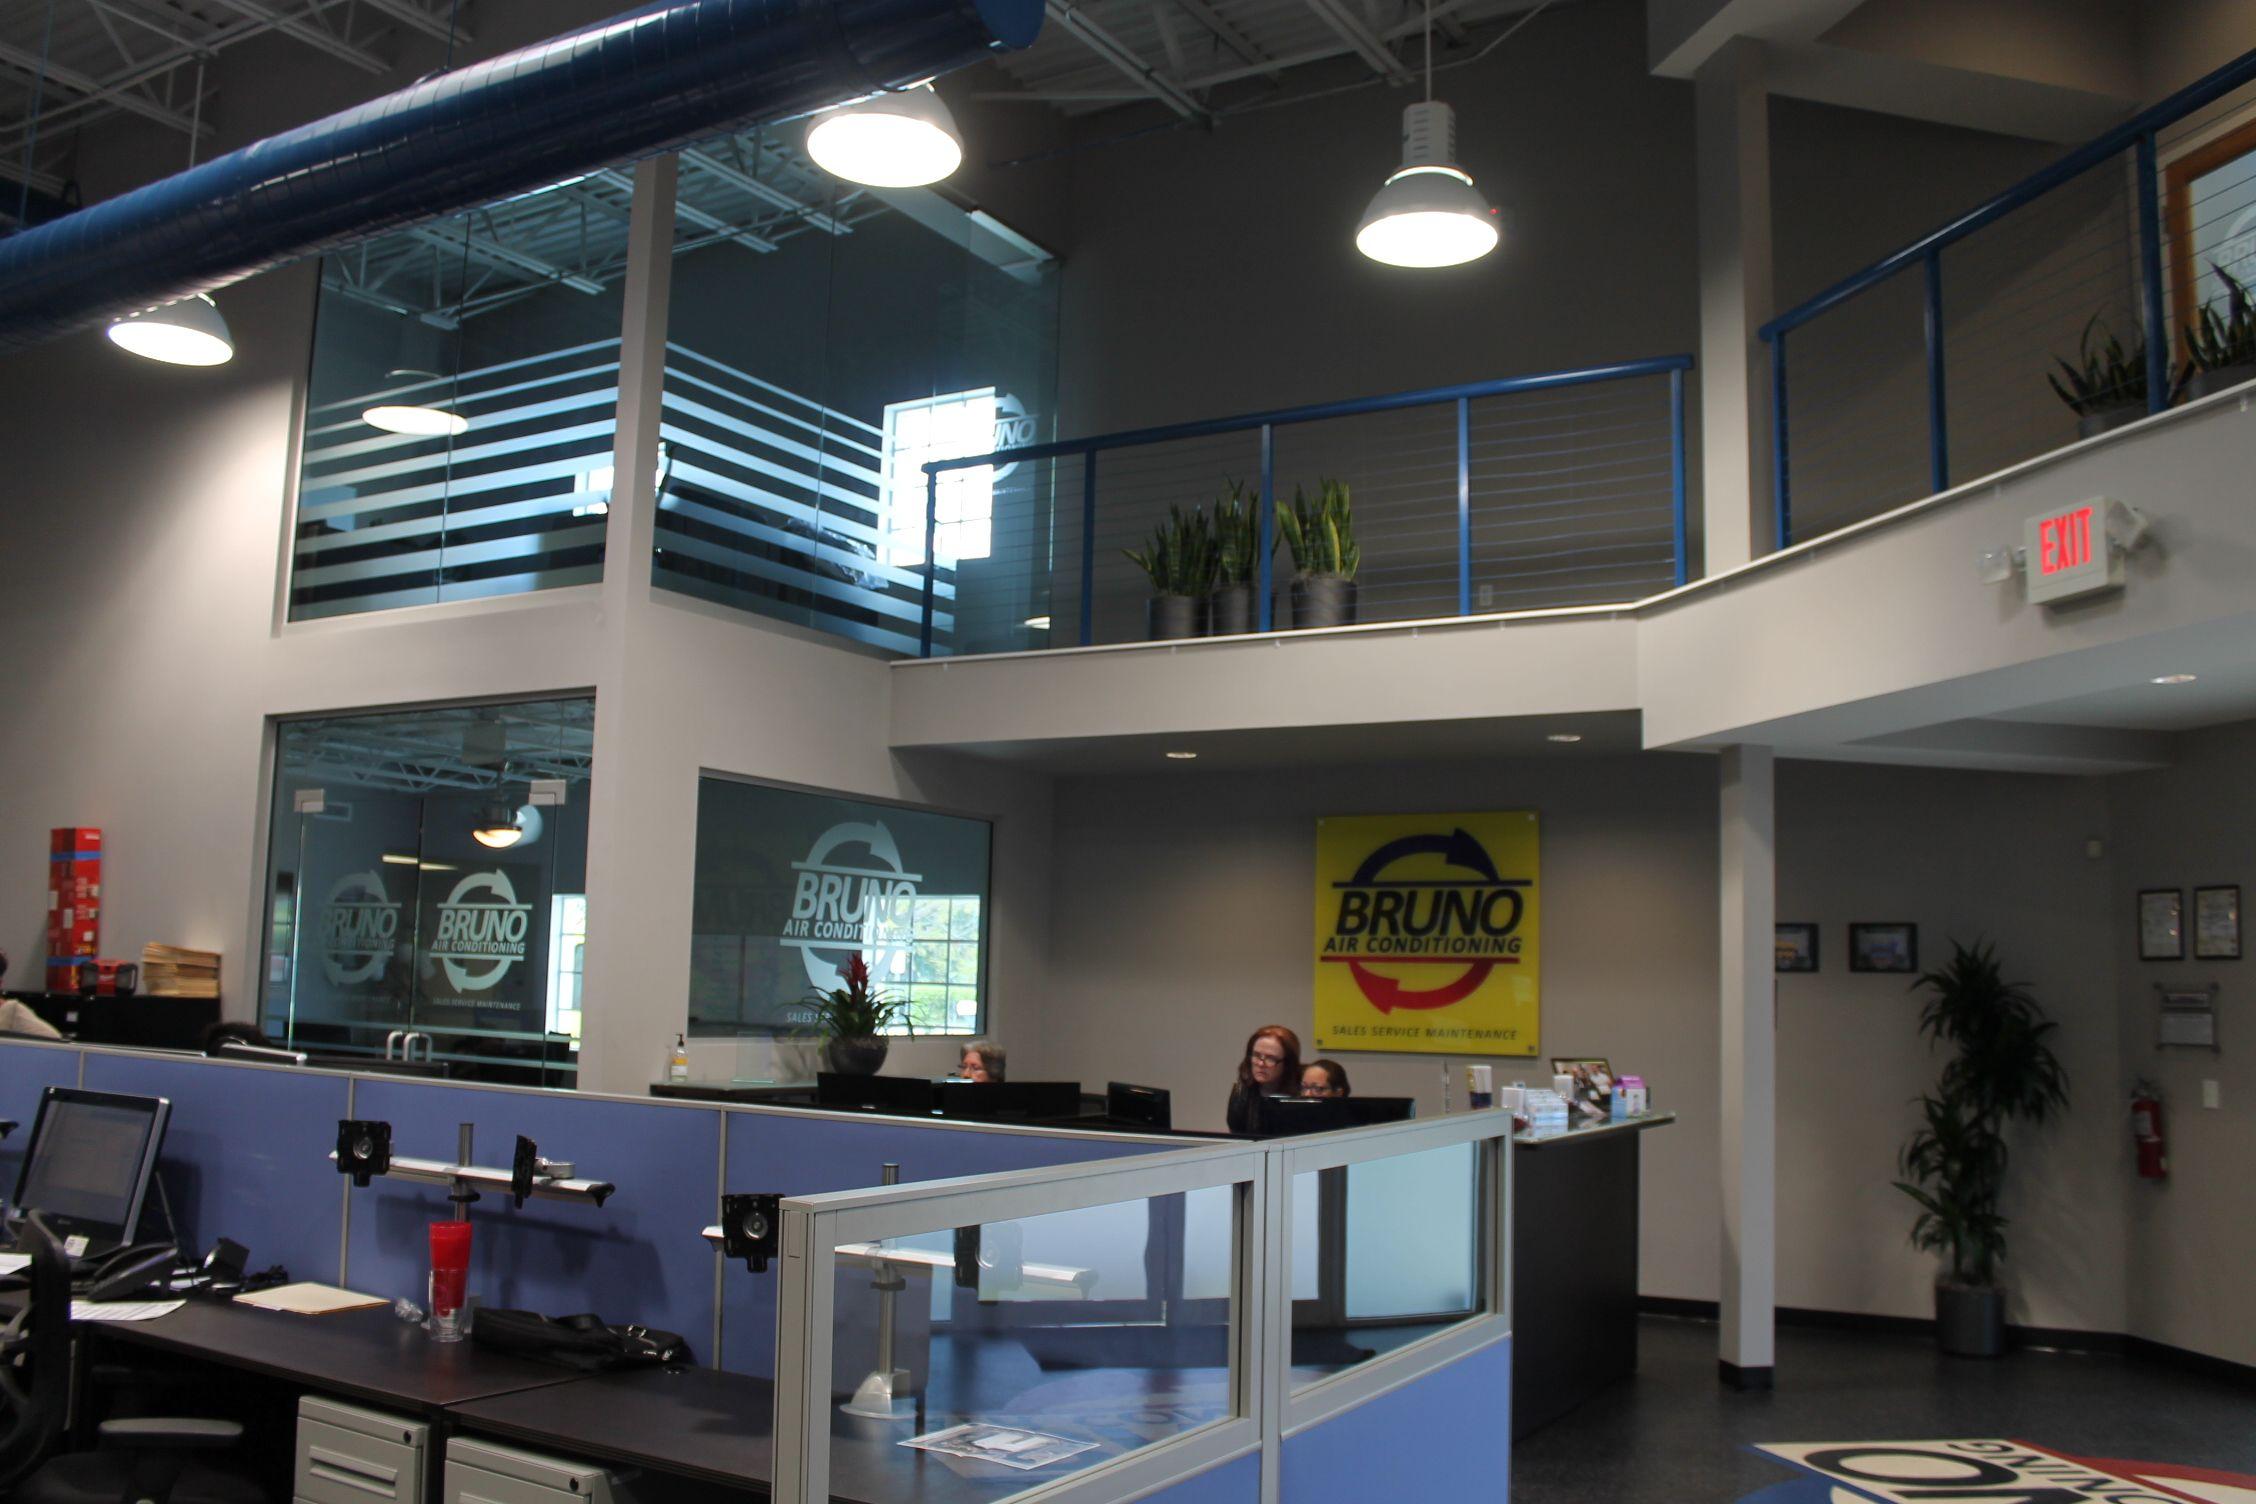 Bruno Air Conditioning Bonita Springs Fl Commercial Tenant Build Out Commercial Construction Renovations Tenants